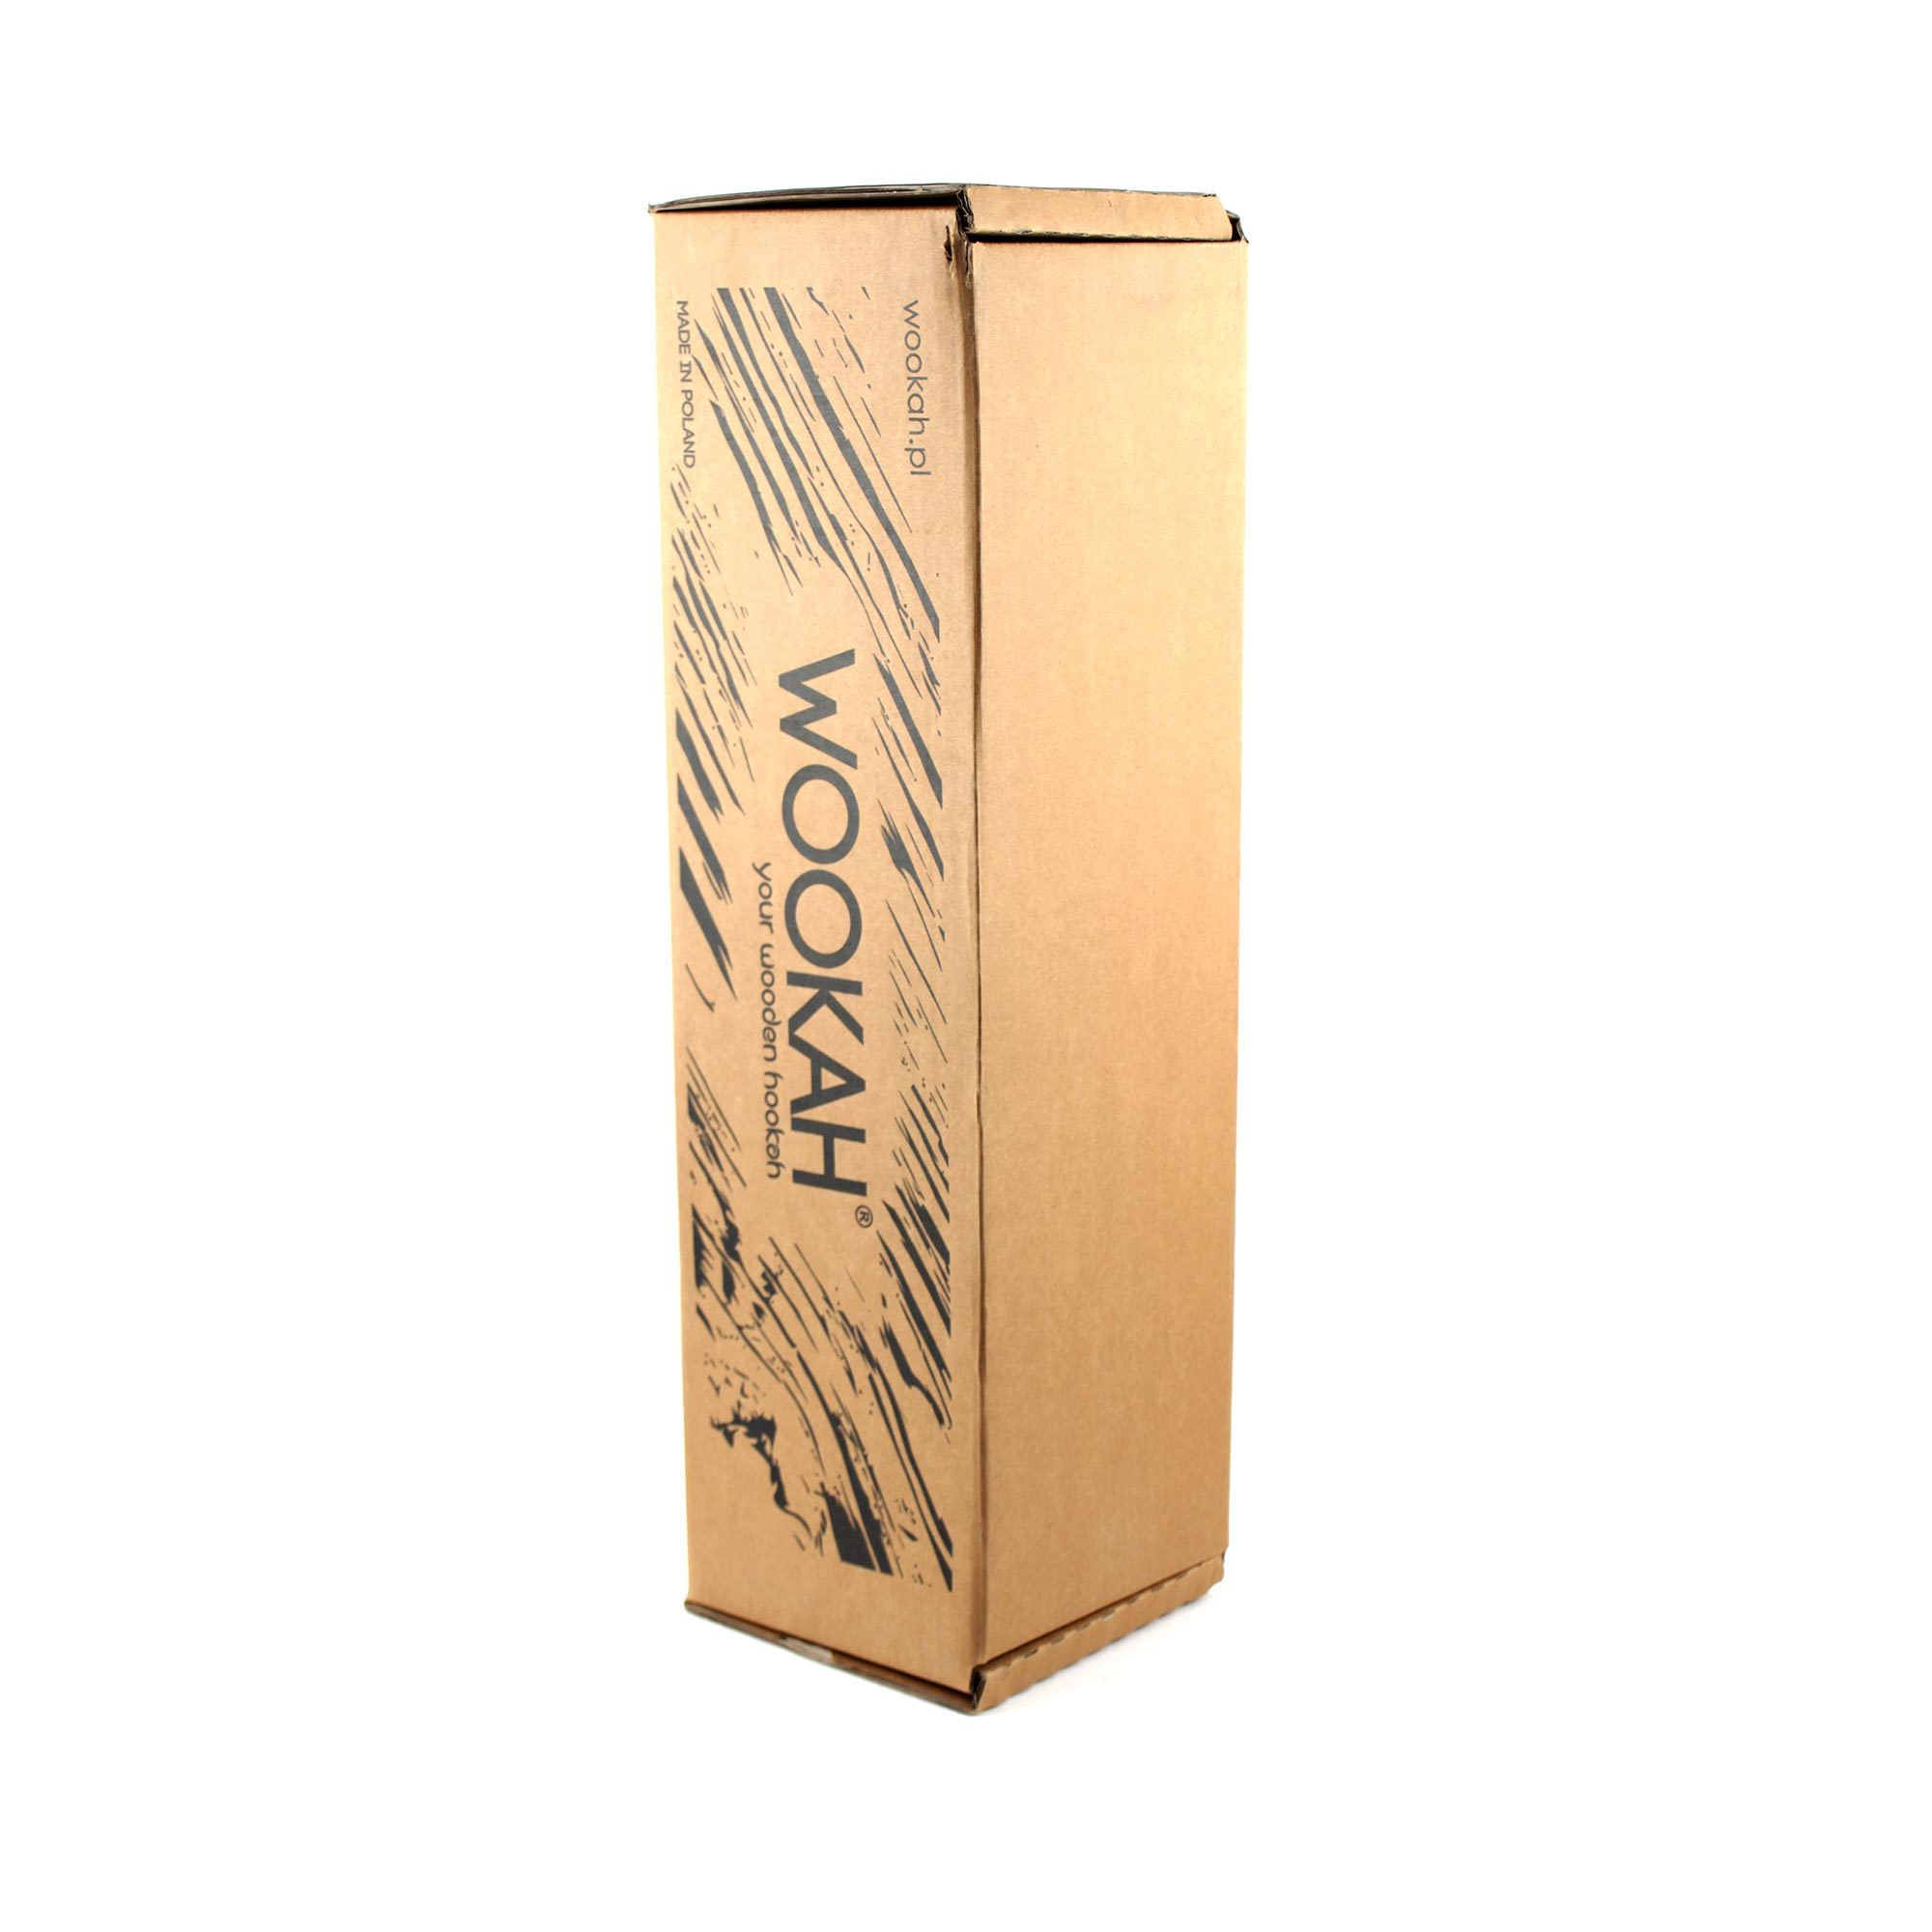 Фирменная коробка кальяна Wookah Red-White с колбой Smooth